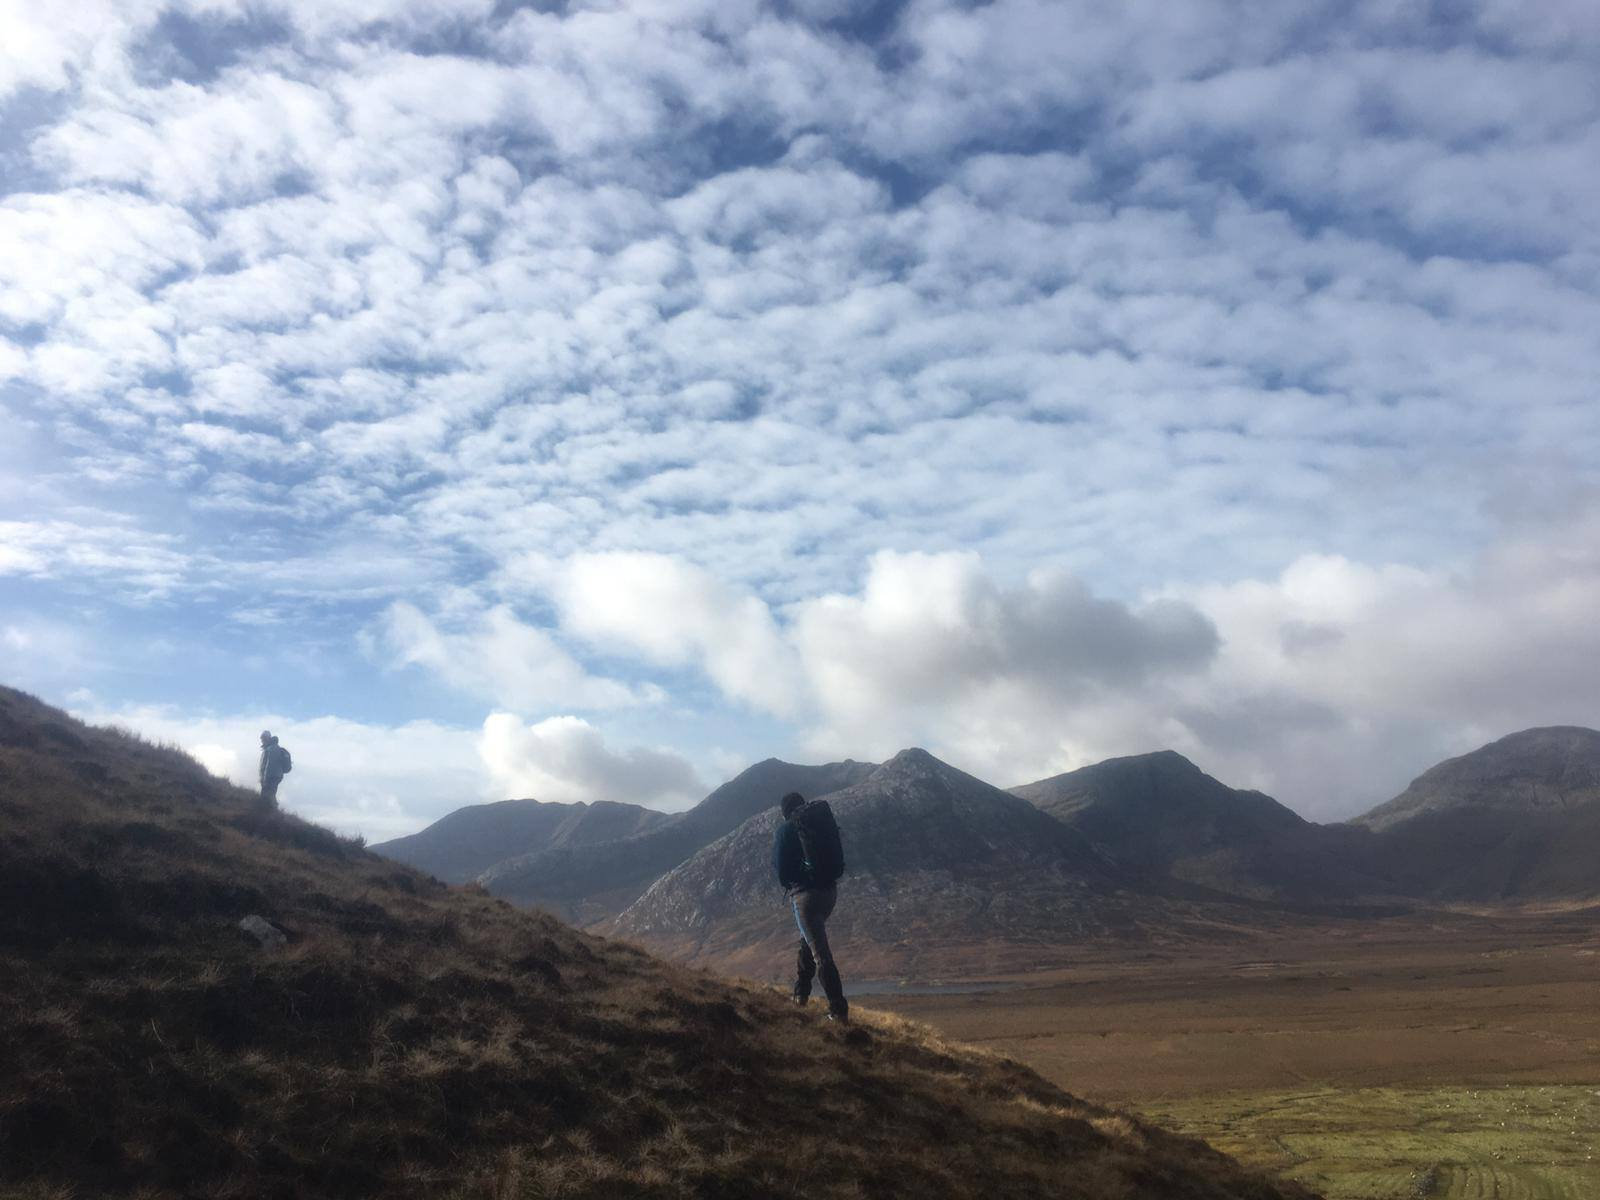 Full Day Hike in Connemara